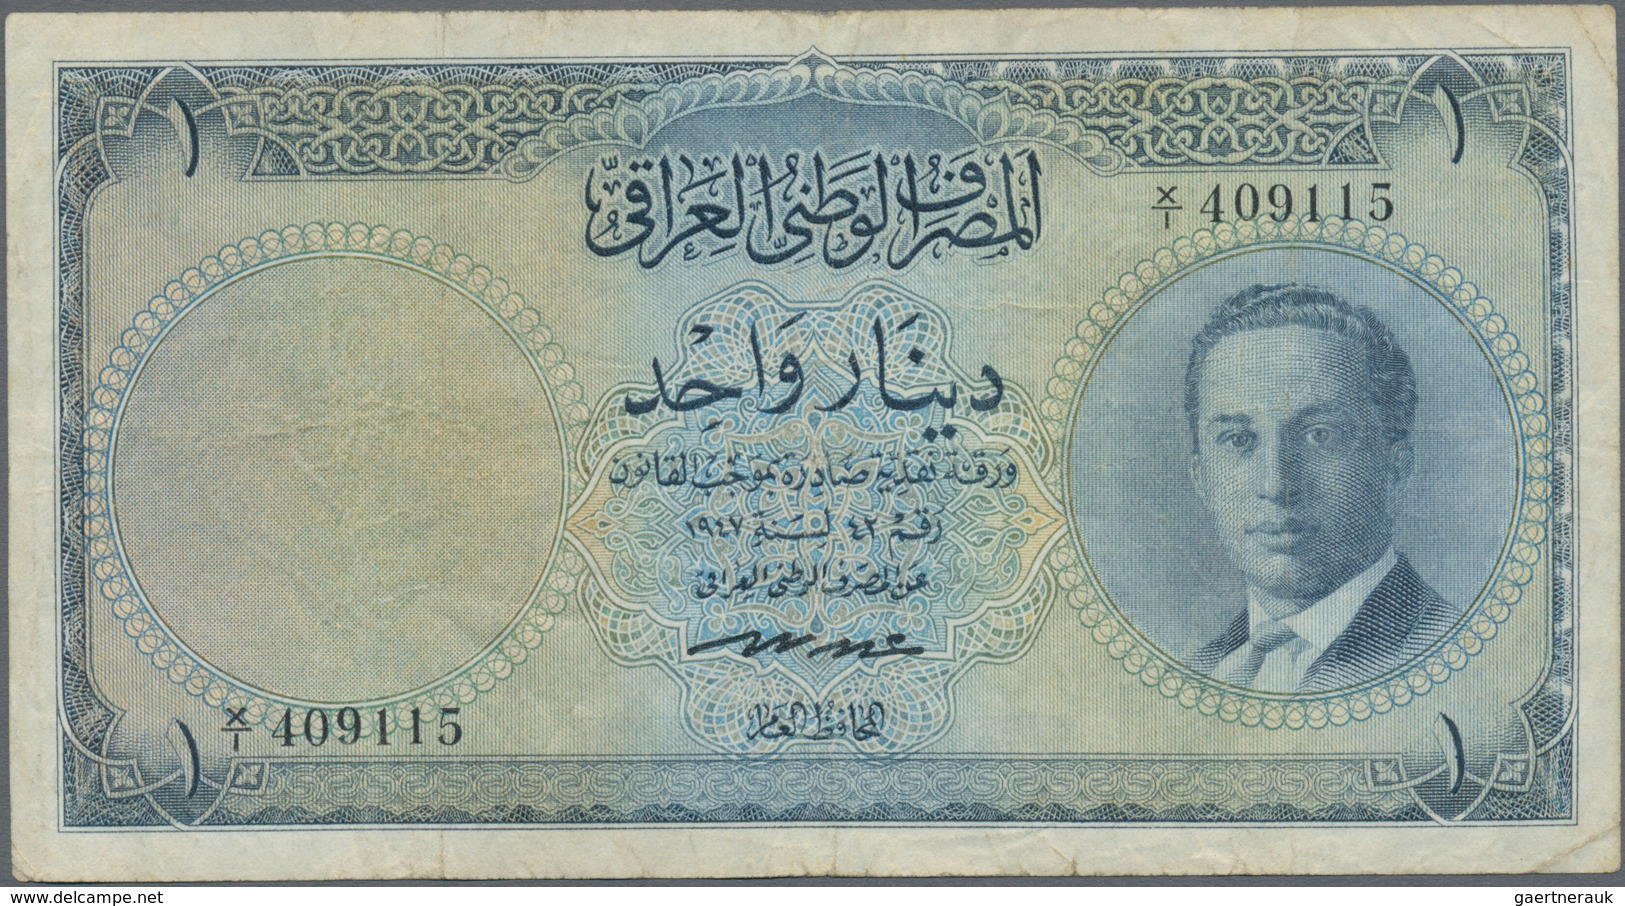 Iraq / Irak: 1 Dinar 1955 P. 39, Used With Folds And Creases, Minor Border Tear, No Holes, No Repair - Iraq